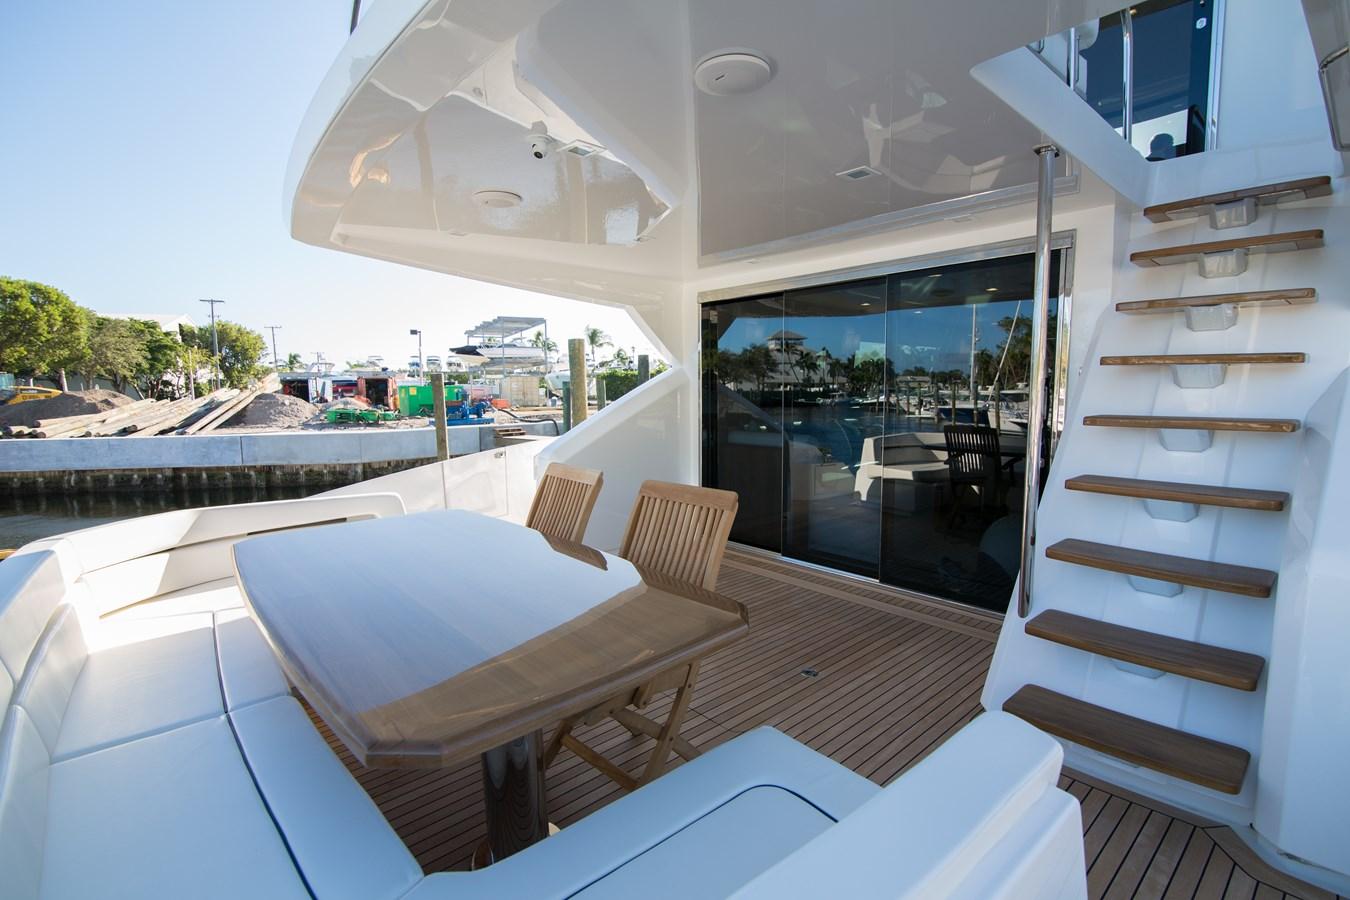 2020 VIKING Motor Yacht Motor Yacht 2772150